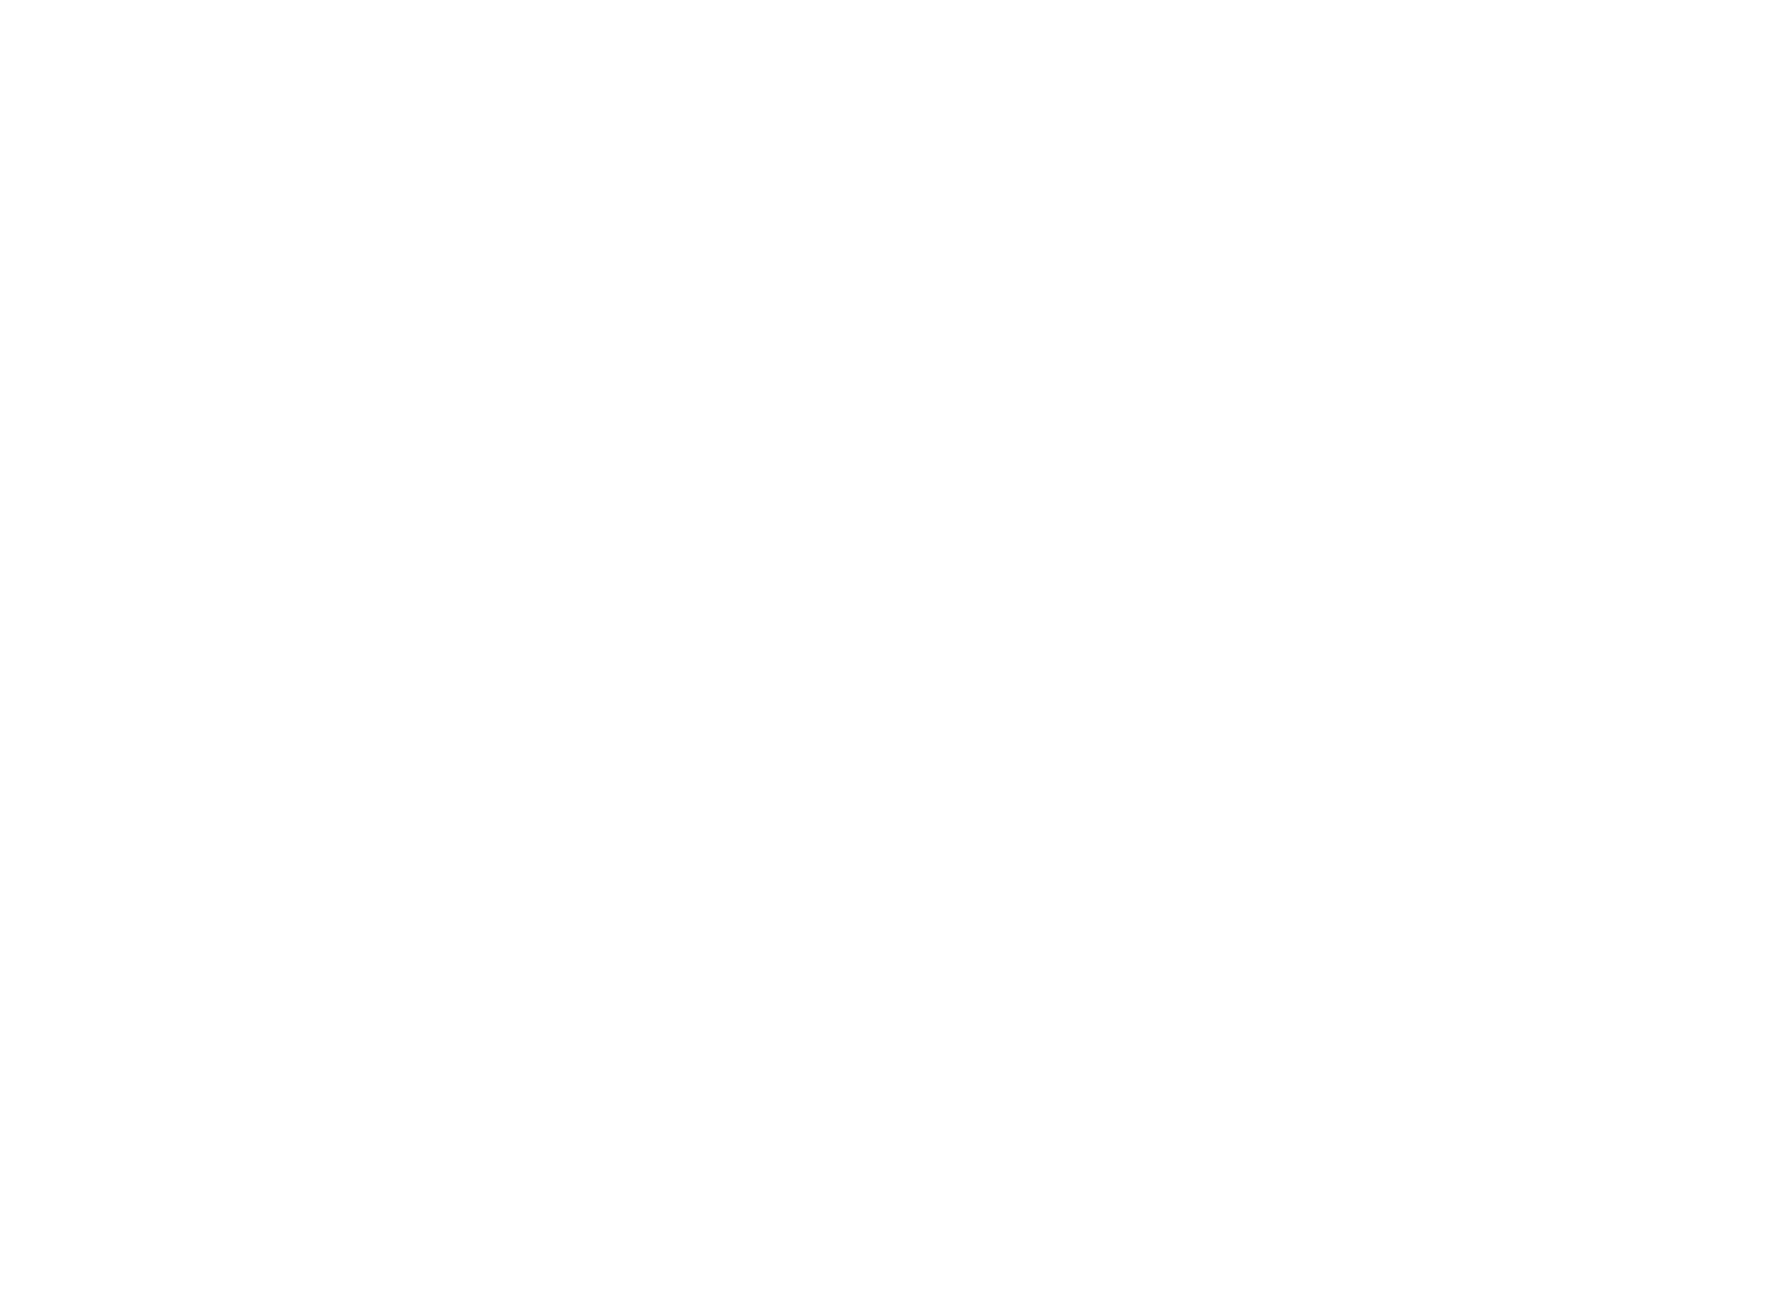 STPR-logo-white.png